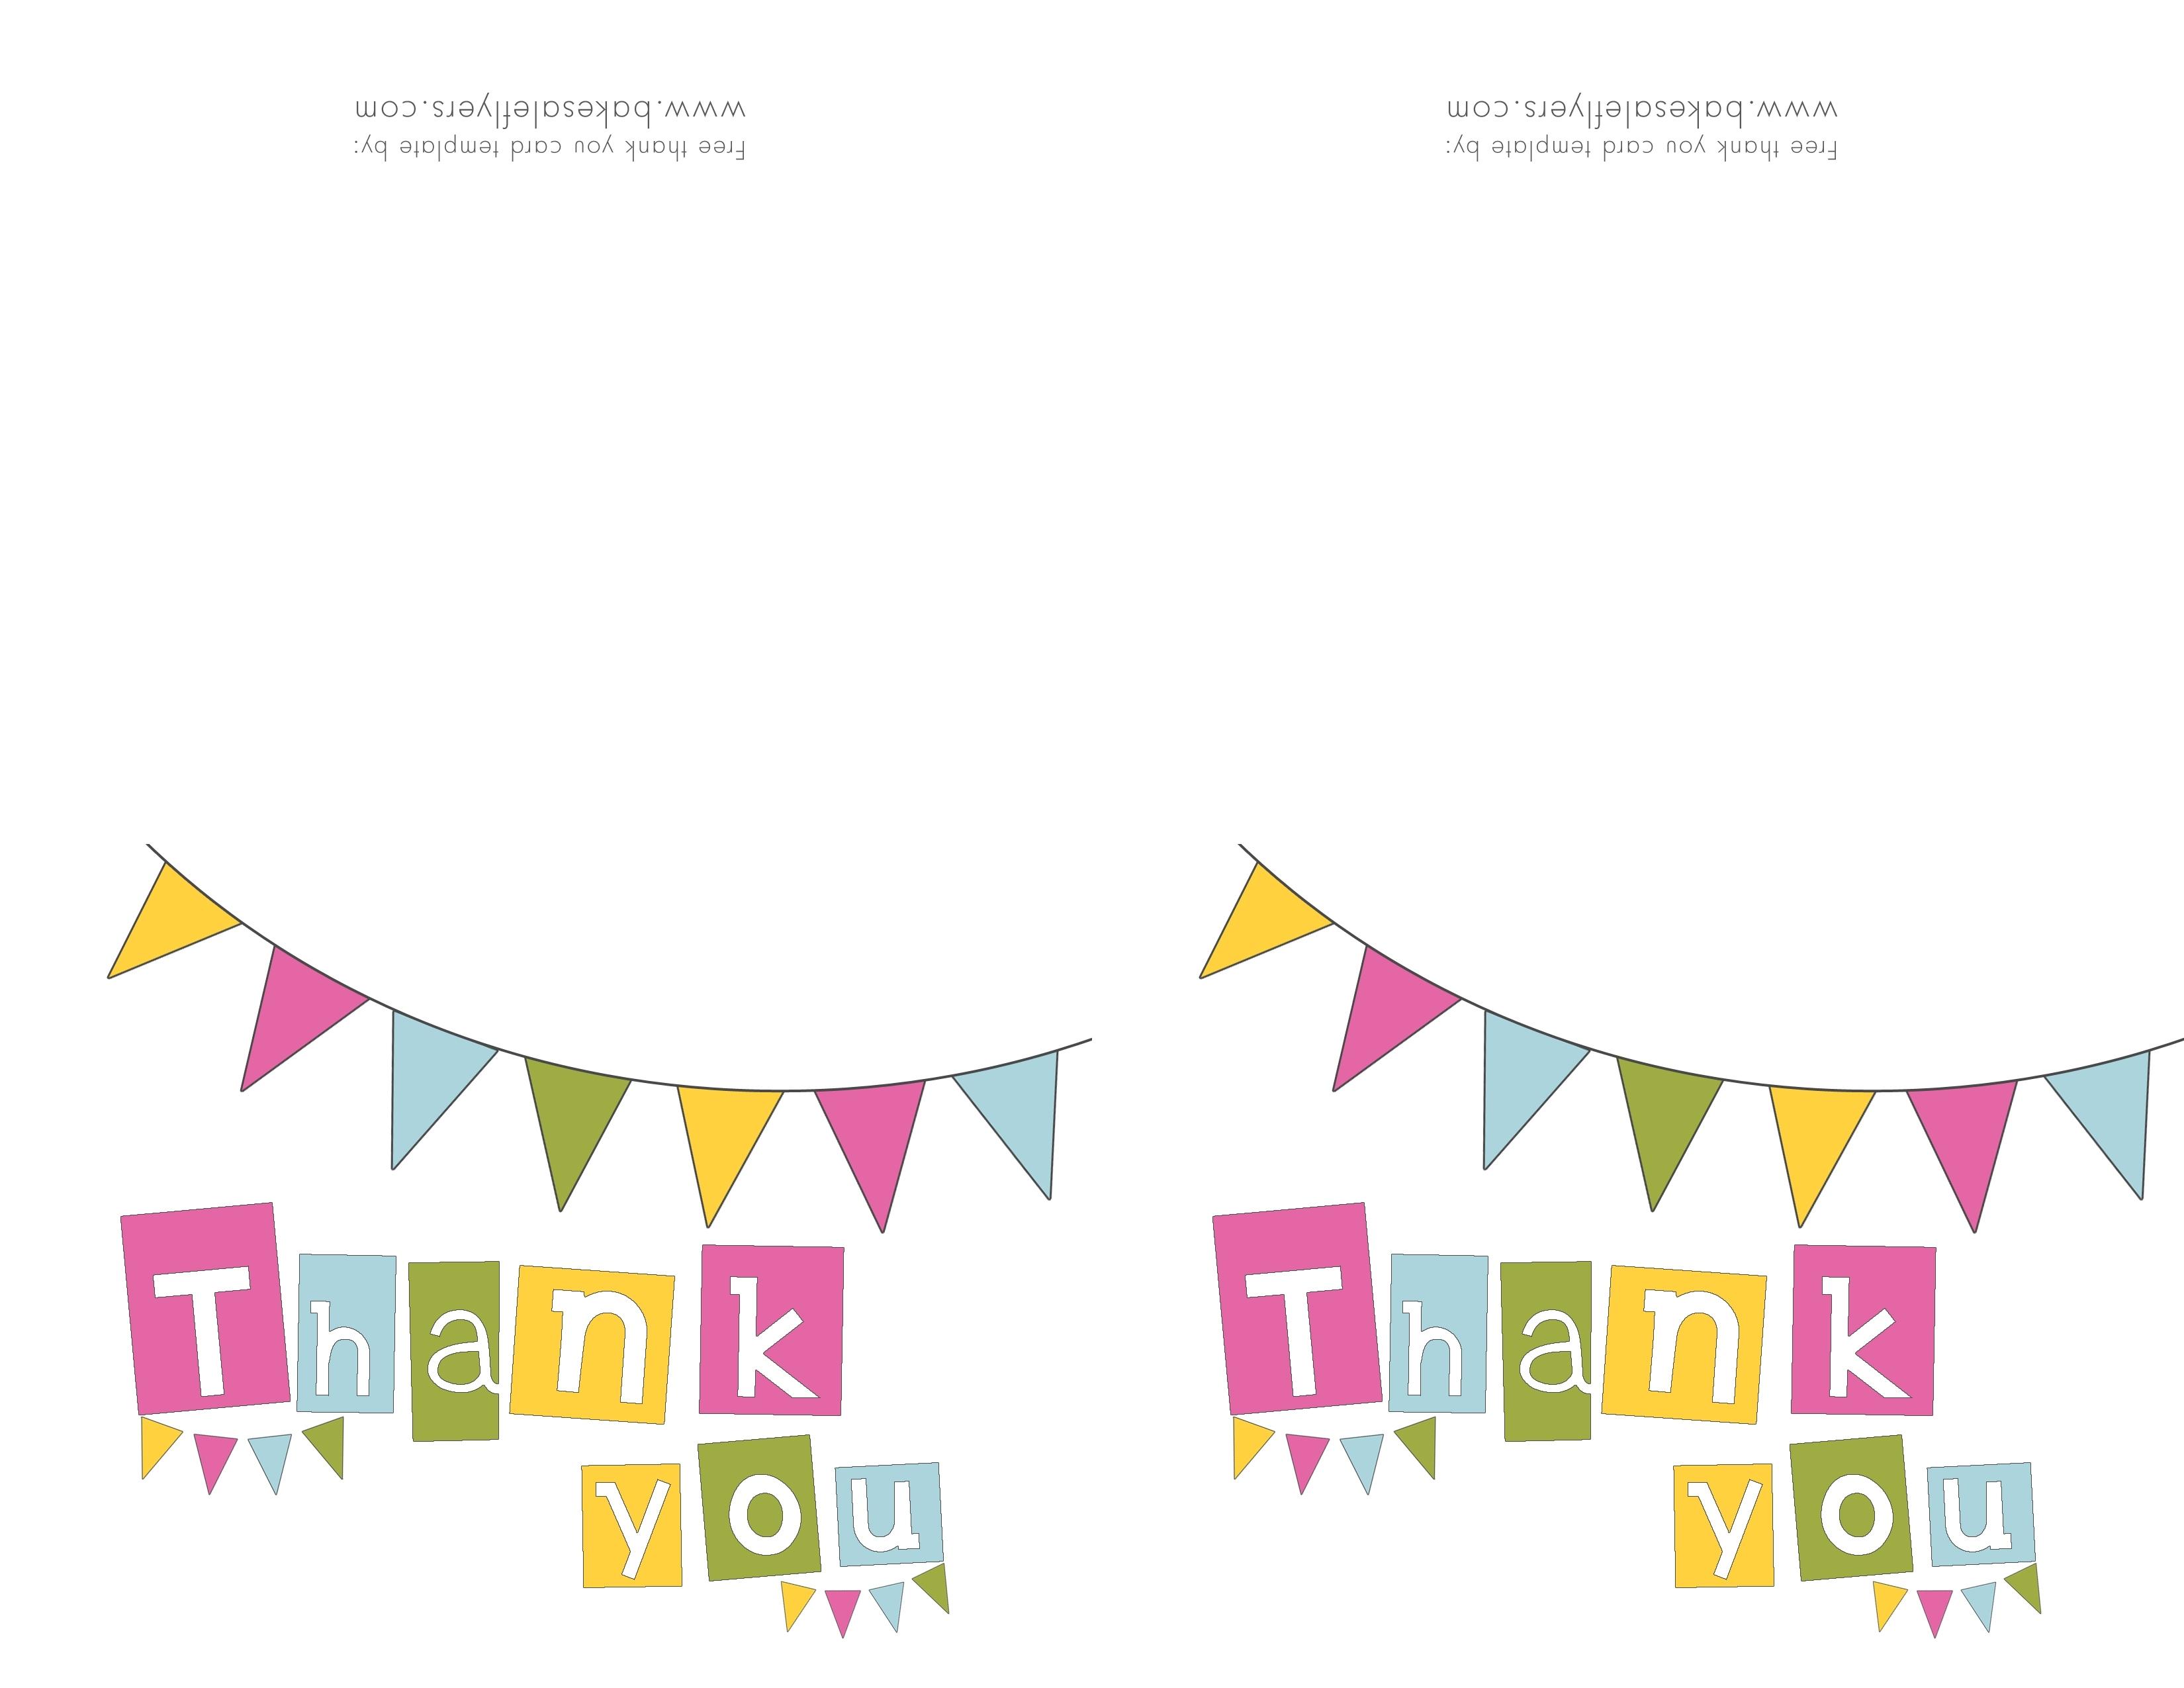 Printable Thank You Card Template   Reactorread - Thank You Card Free Printable Template